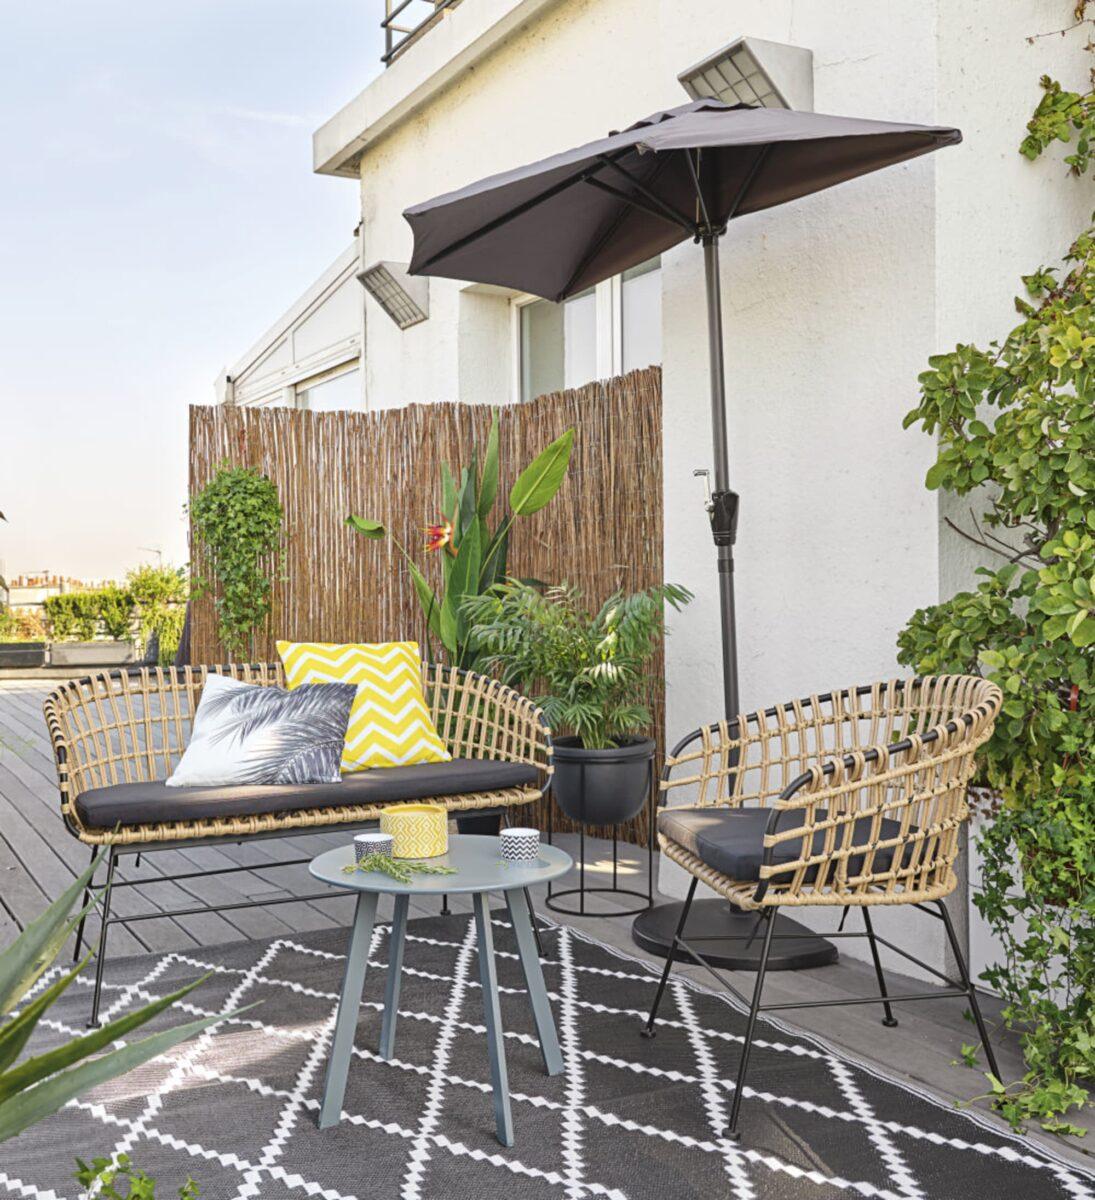 maisons-du-monde-estate-2020-poltrona-da-giardino-in-resina-effetto-rattan-e-tela-nera